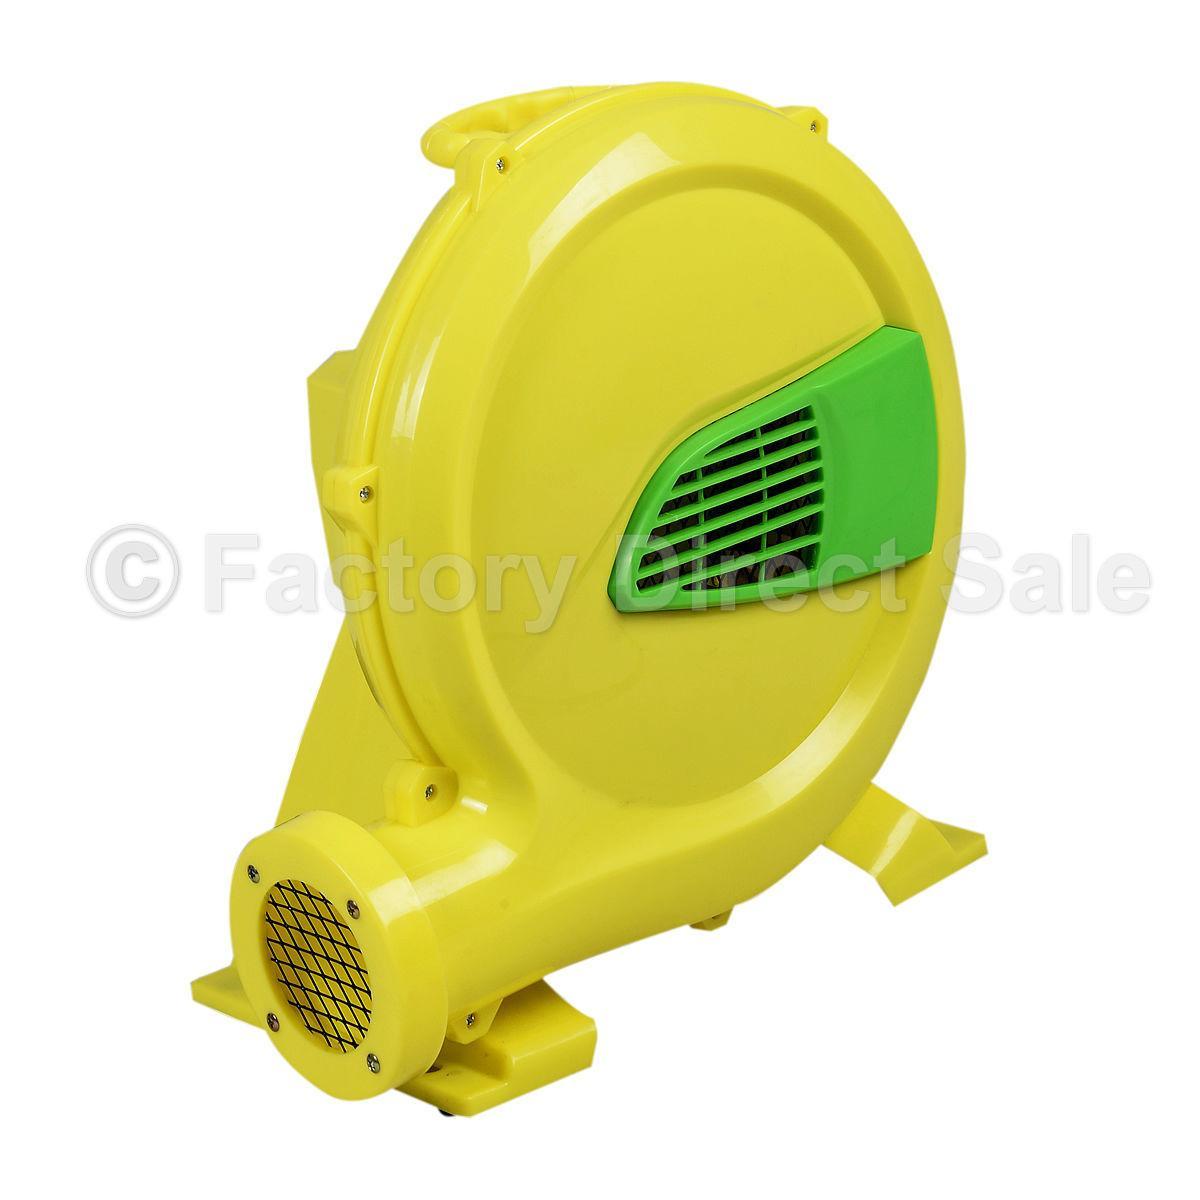 Inflatable Blower Fan : Best air blower pump fan watt hp for inflatable